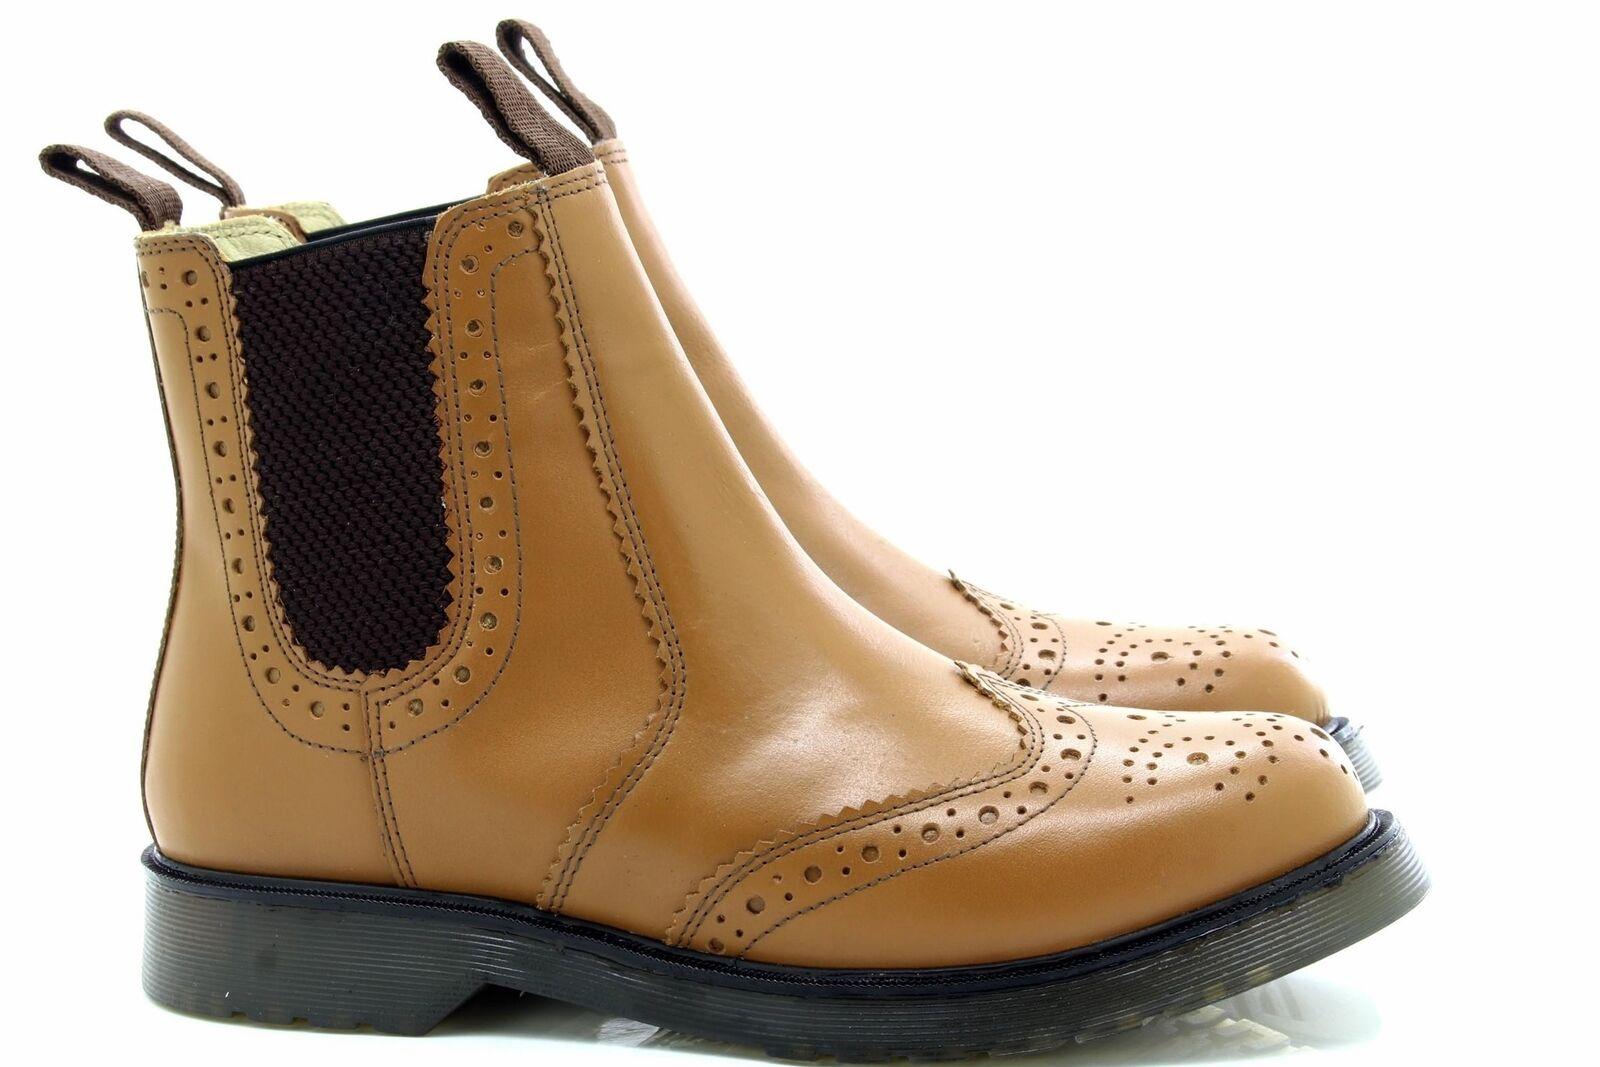 Grafters Classic Brogue Gusset Dealer Boots Oxblood Hi-Shine